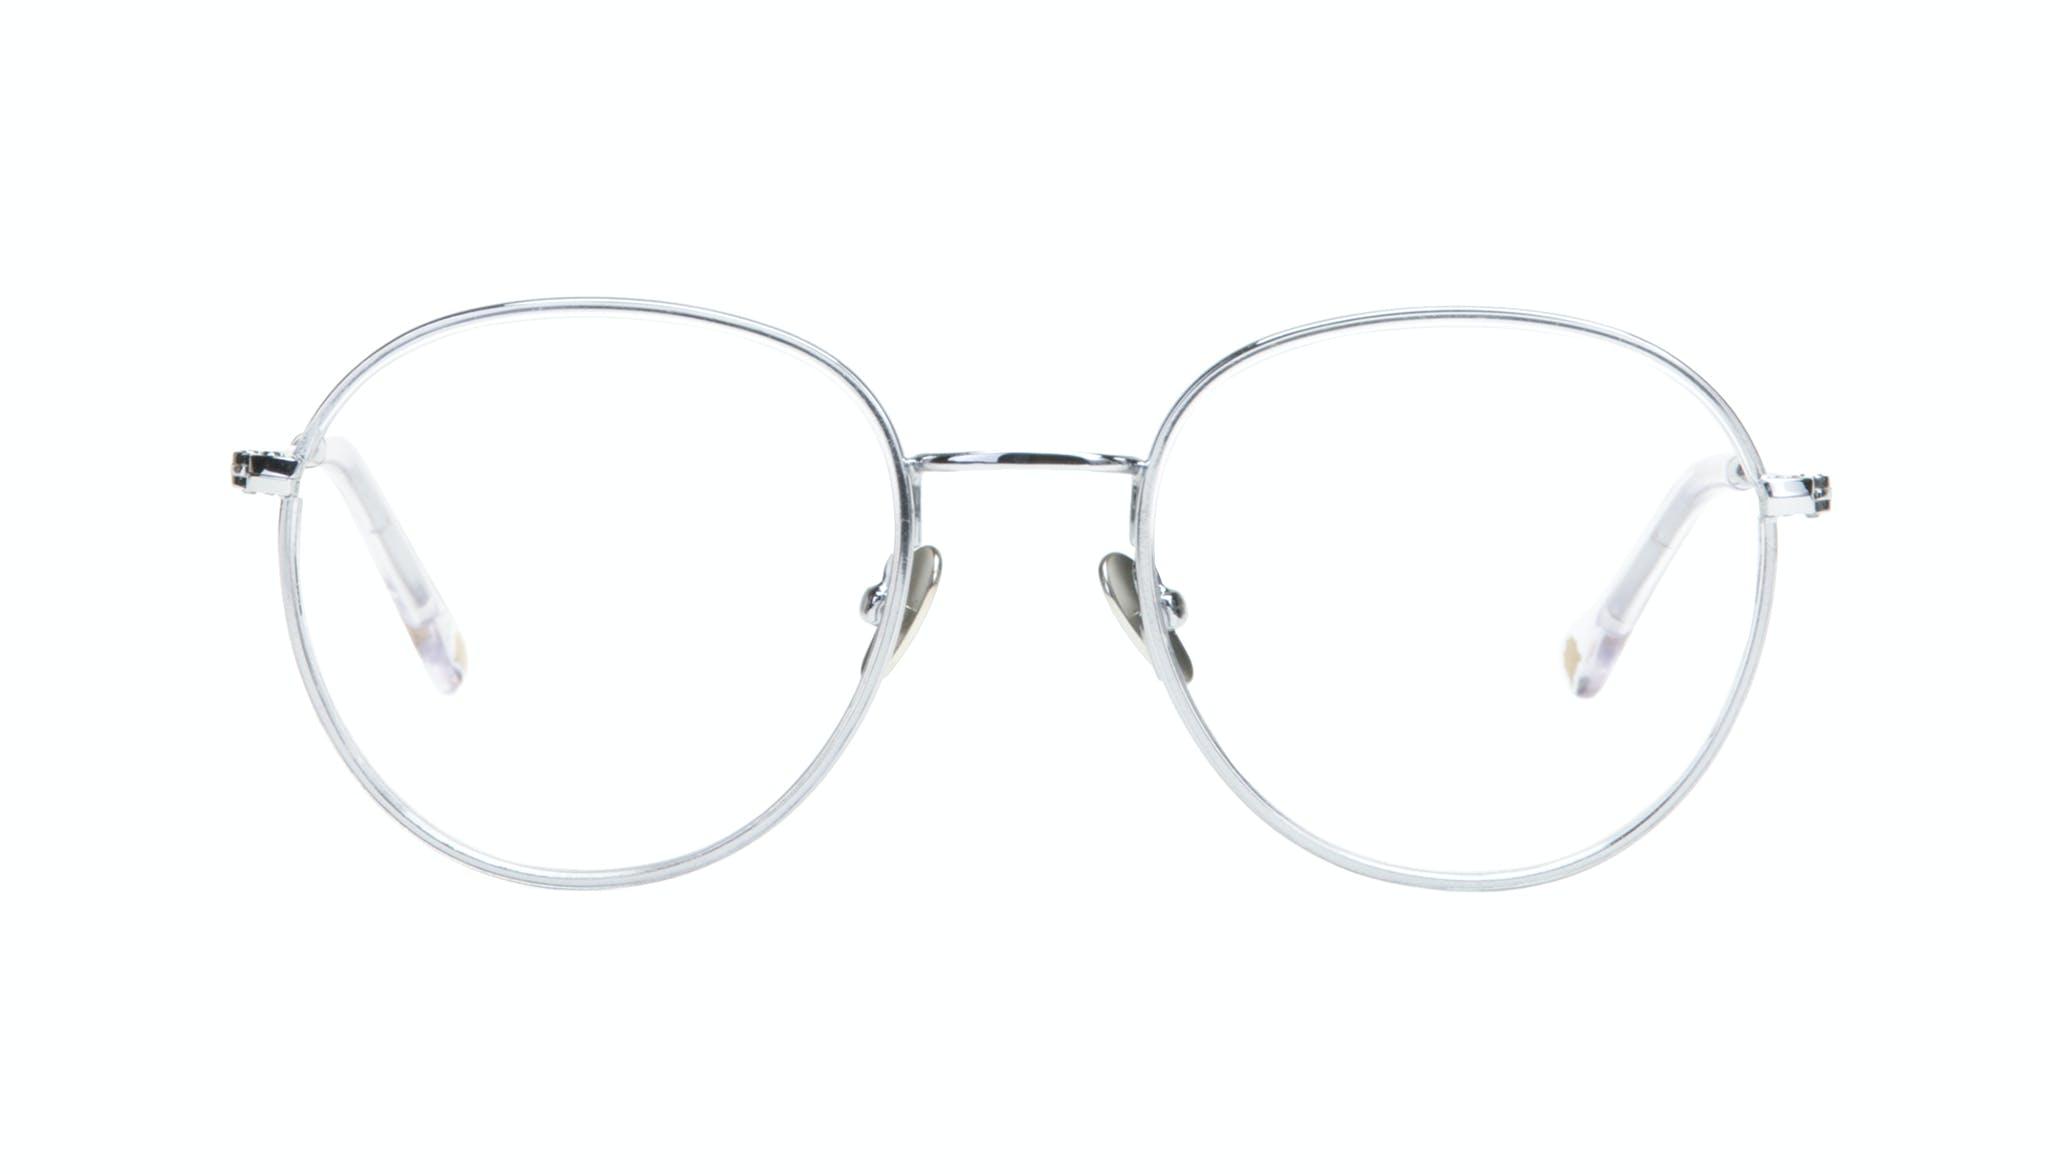 Affordable Fashion Glasses Aviator Round Eyeglasses Women Subrosa Glacier Front